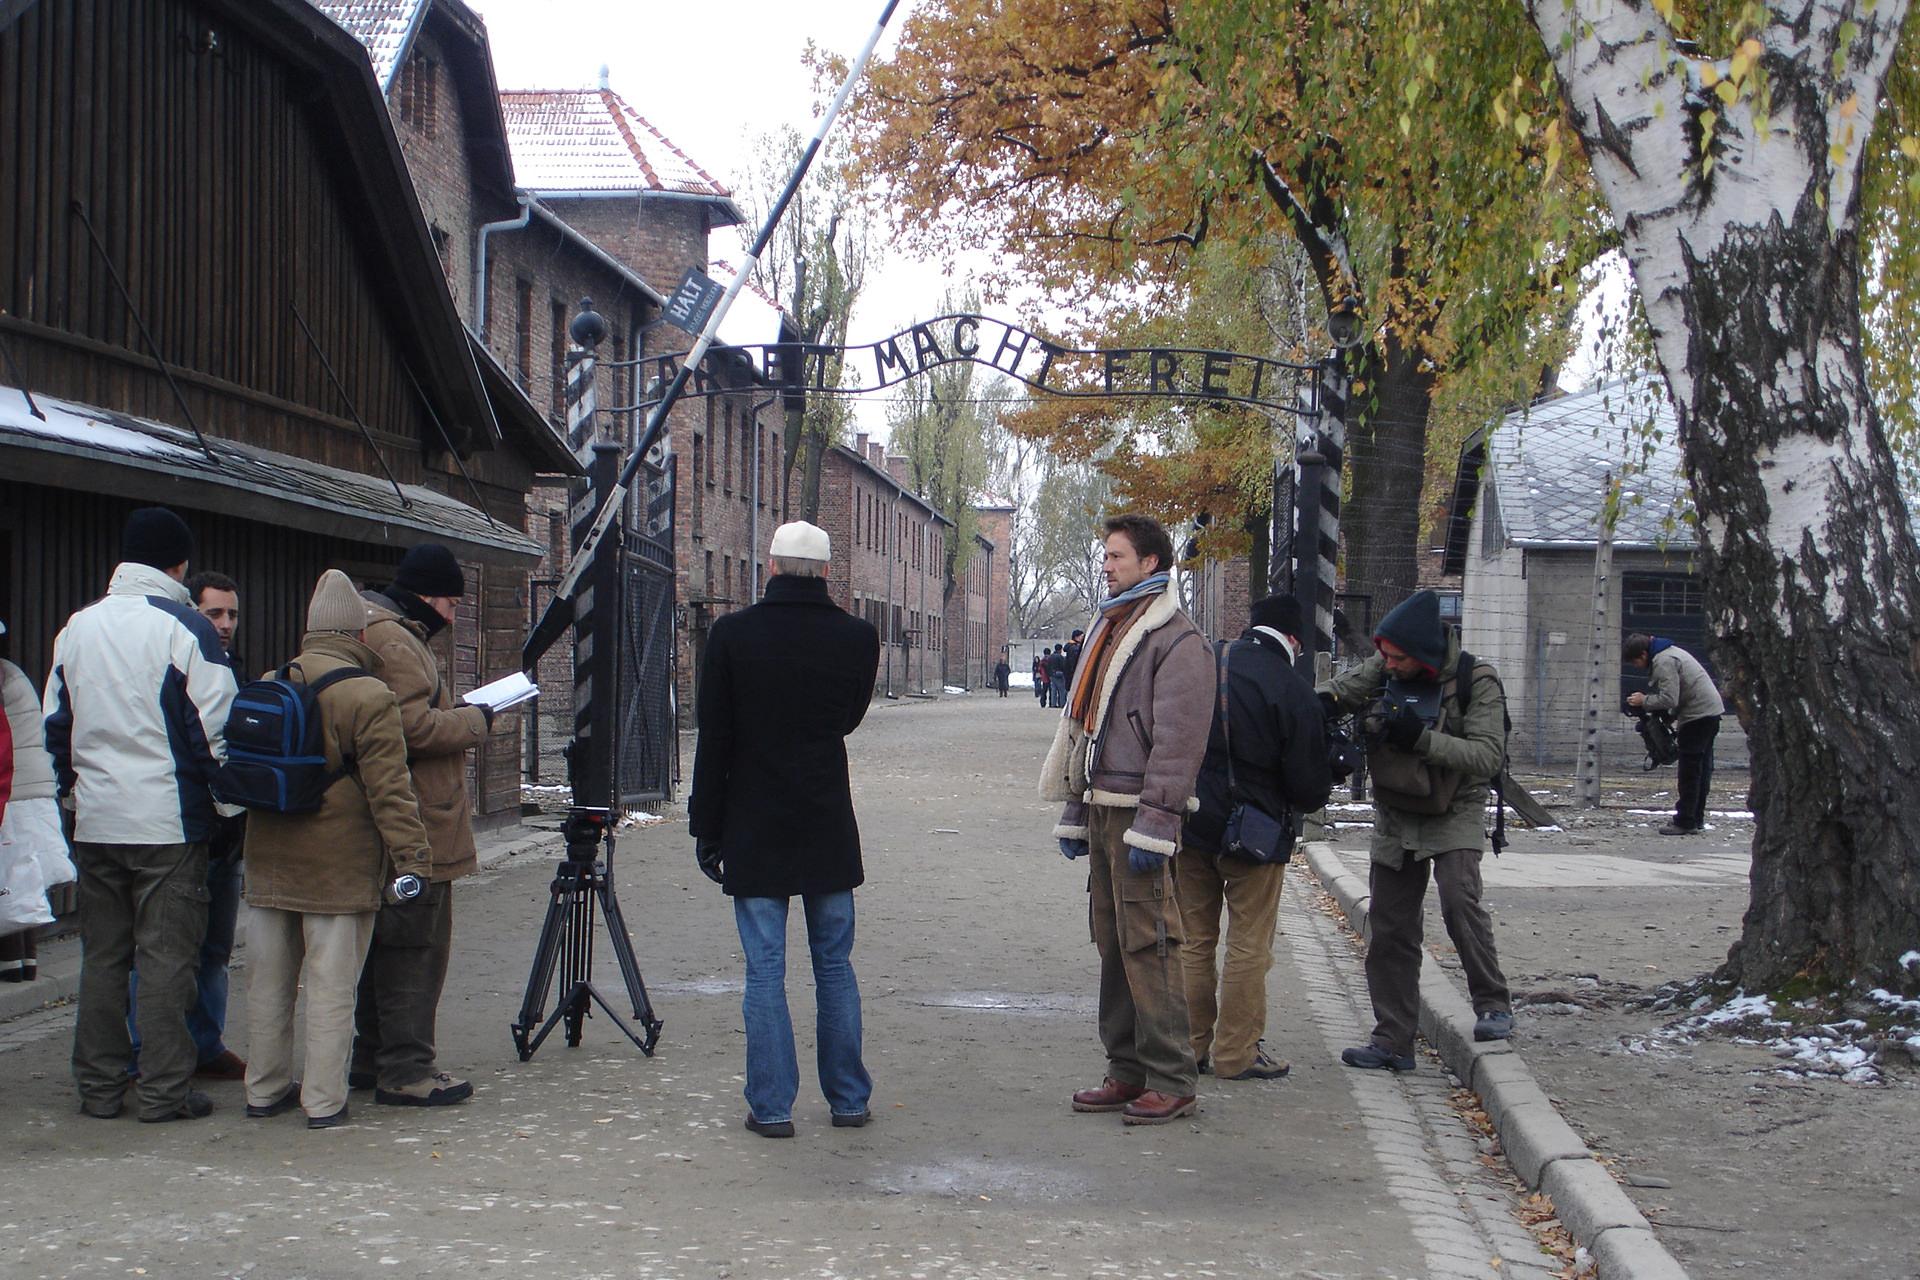 miguel angel tobias proyecto audiovisual accamedia programa television destino europa